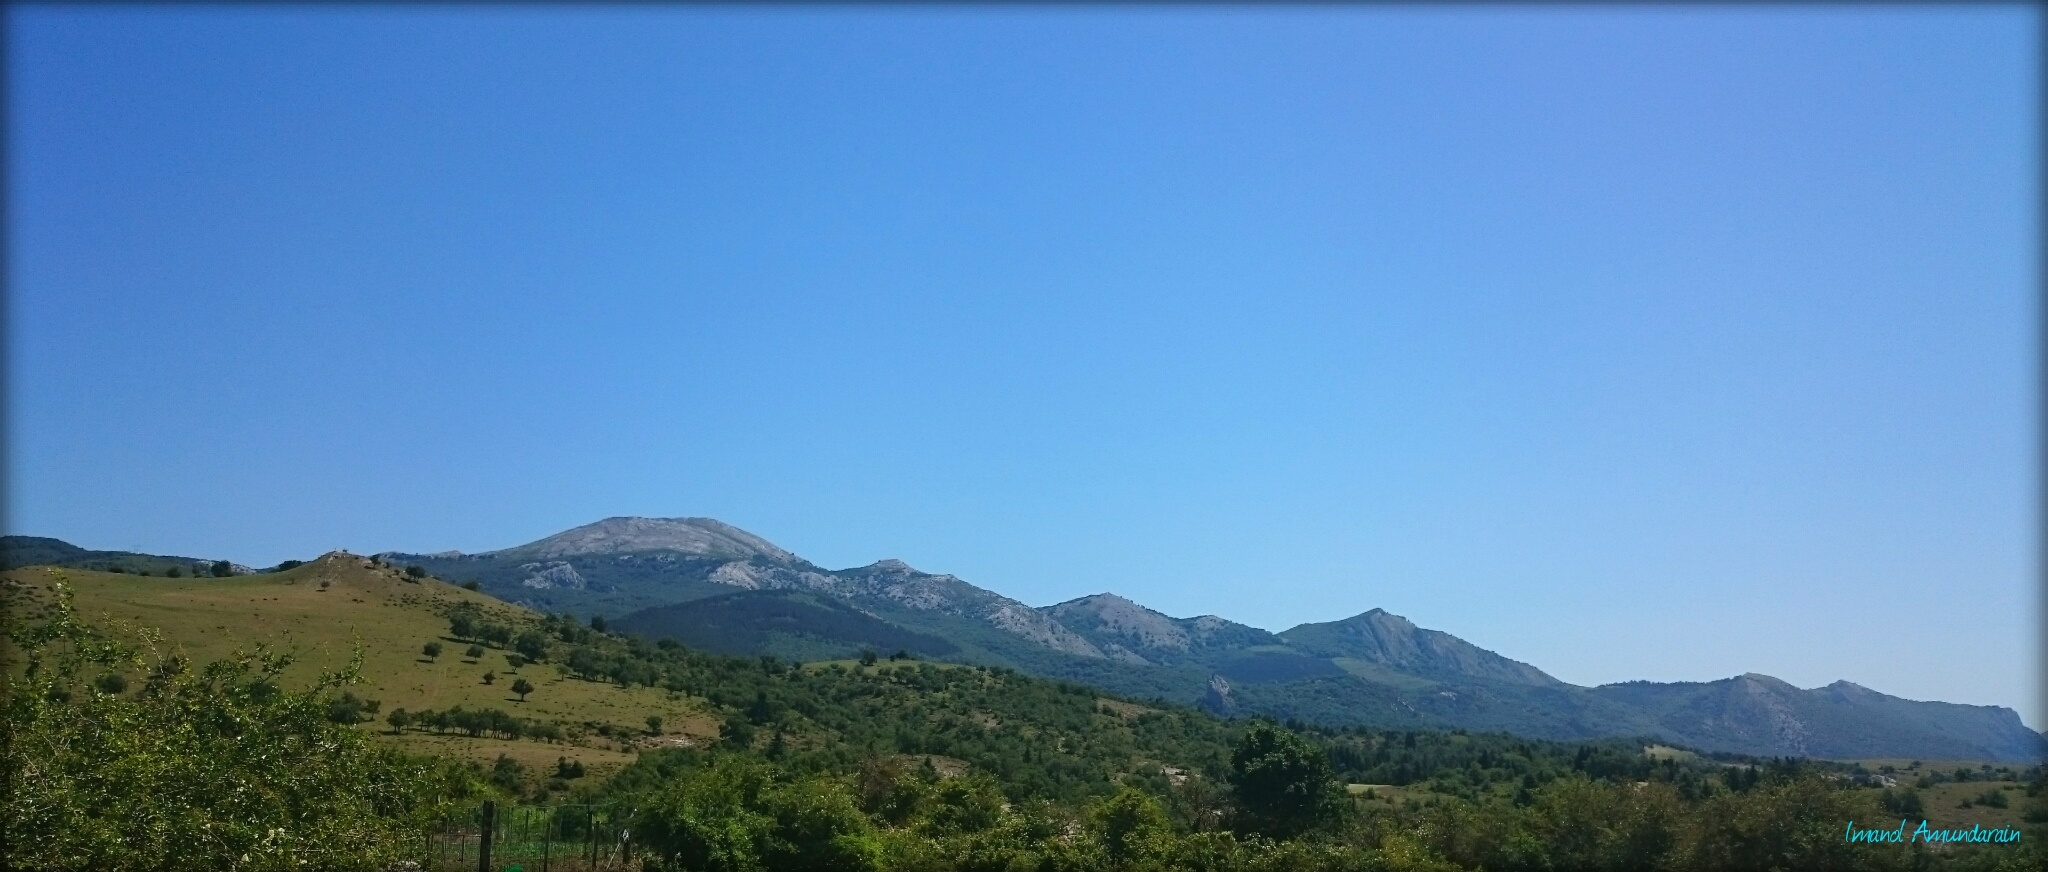 Aitzgorri - Aratz Natural Park in Álava / Basque Country  by  Imanol Amunain Eyael